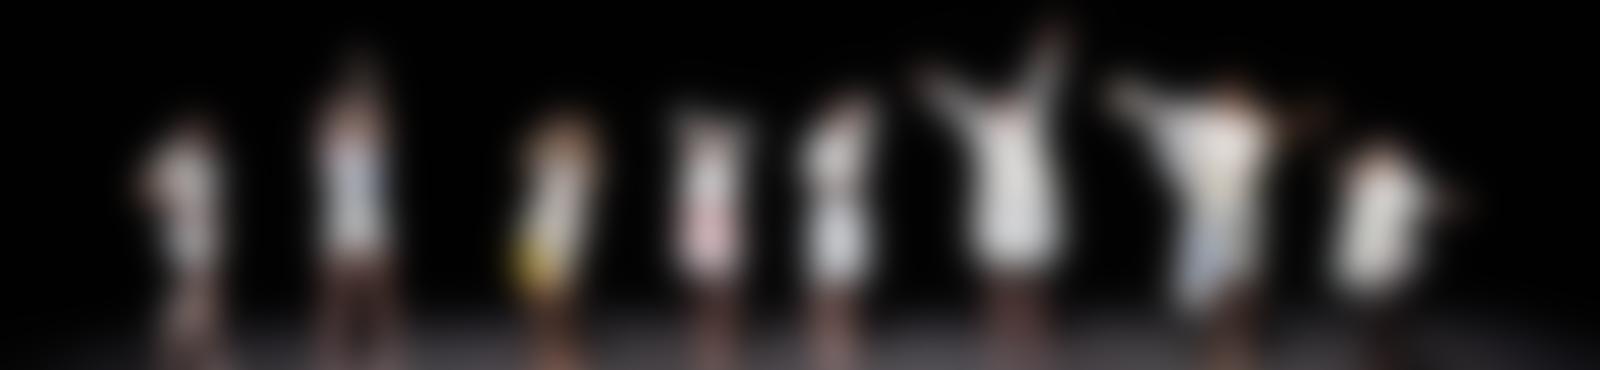 Blurred d7c0ba37 7361 4277 81f7 7dc1d8ce785f